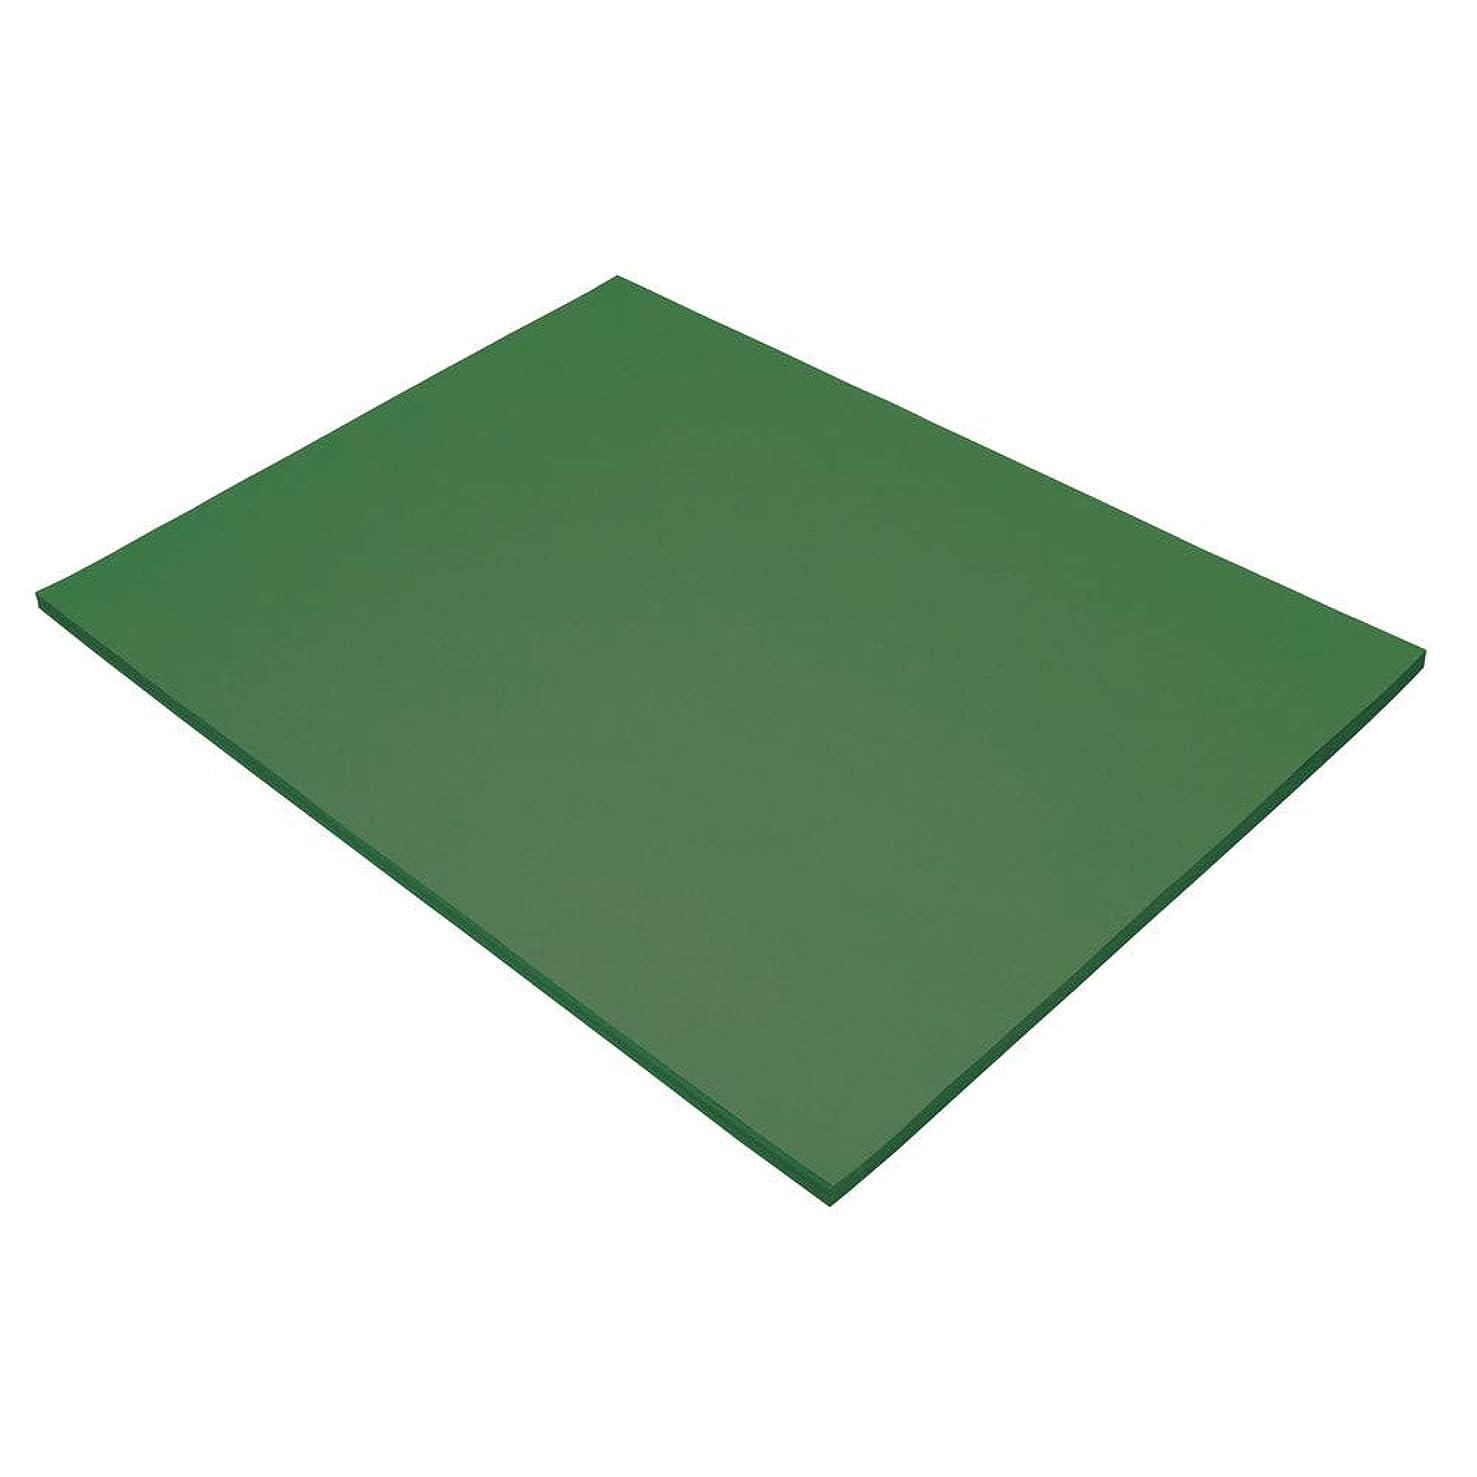 Pacon 103085 Tru-Ray Construction Paper, 18in. x 24in, Dark Green